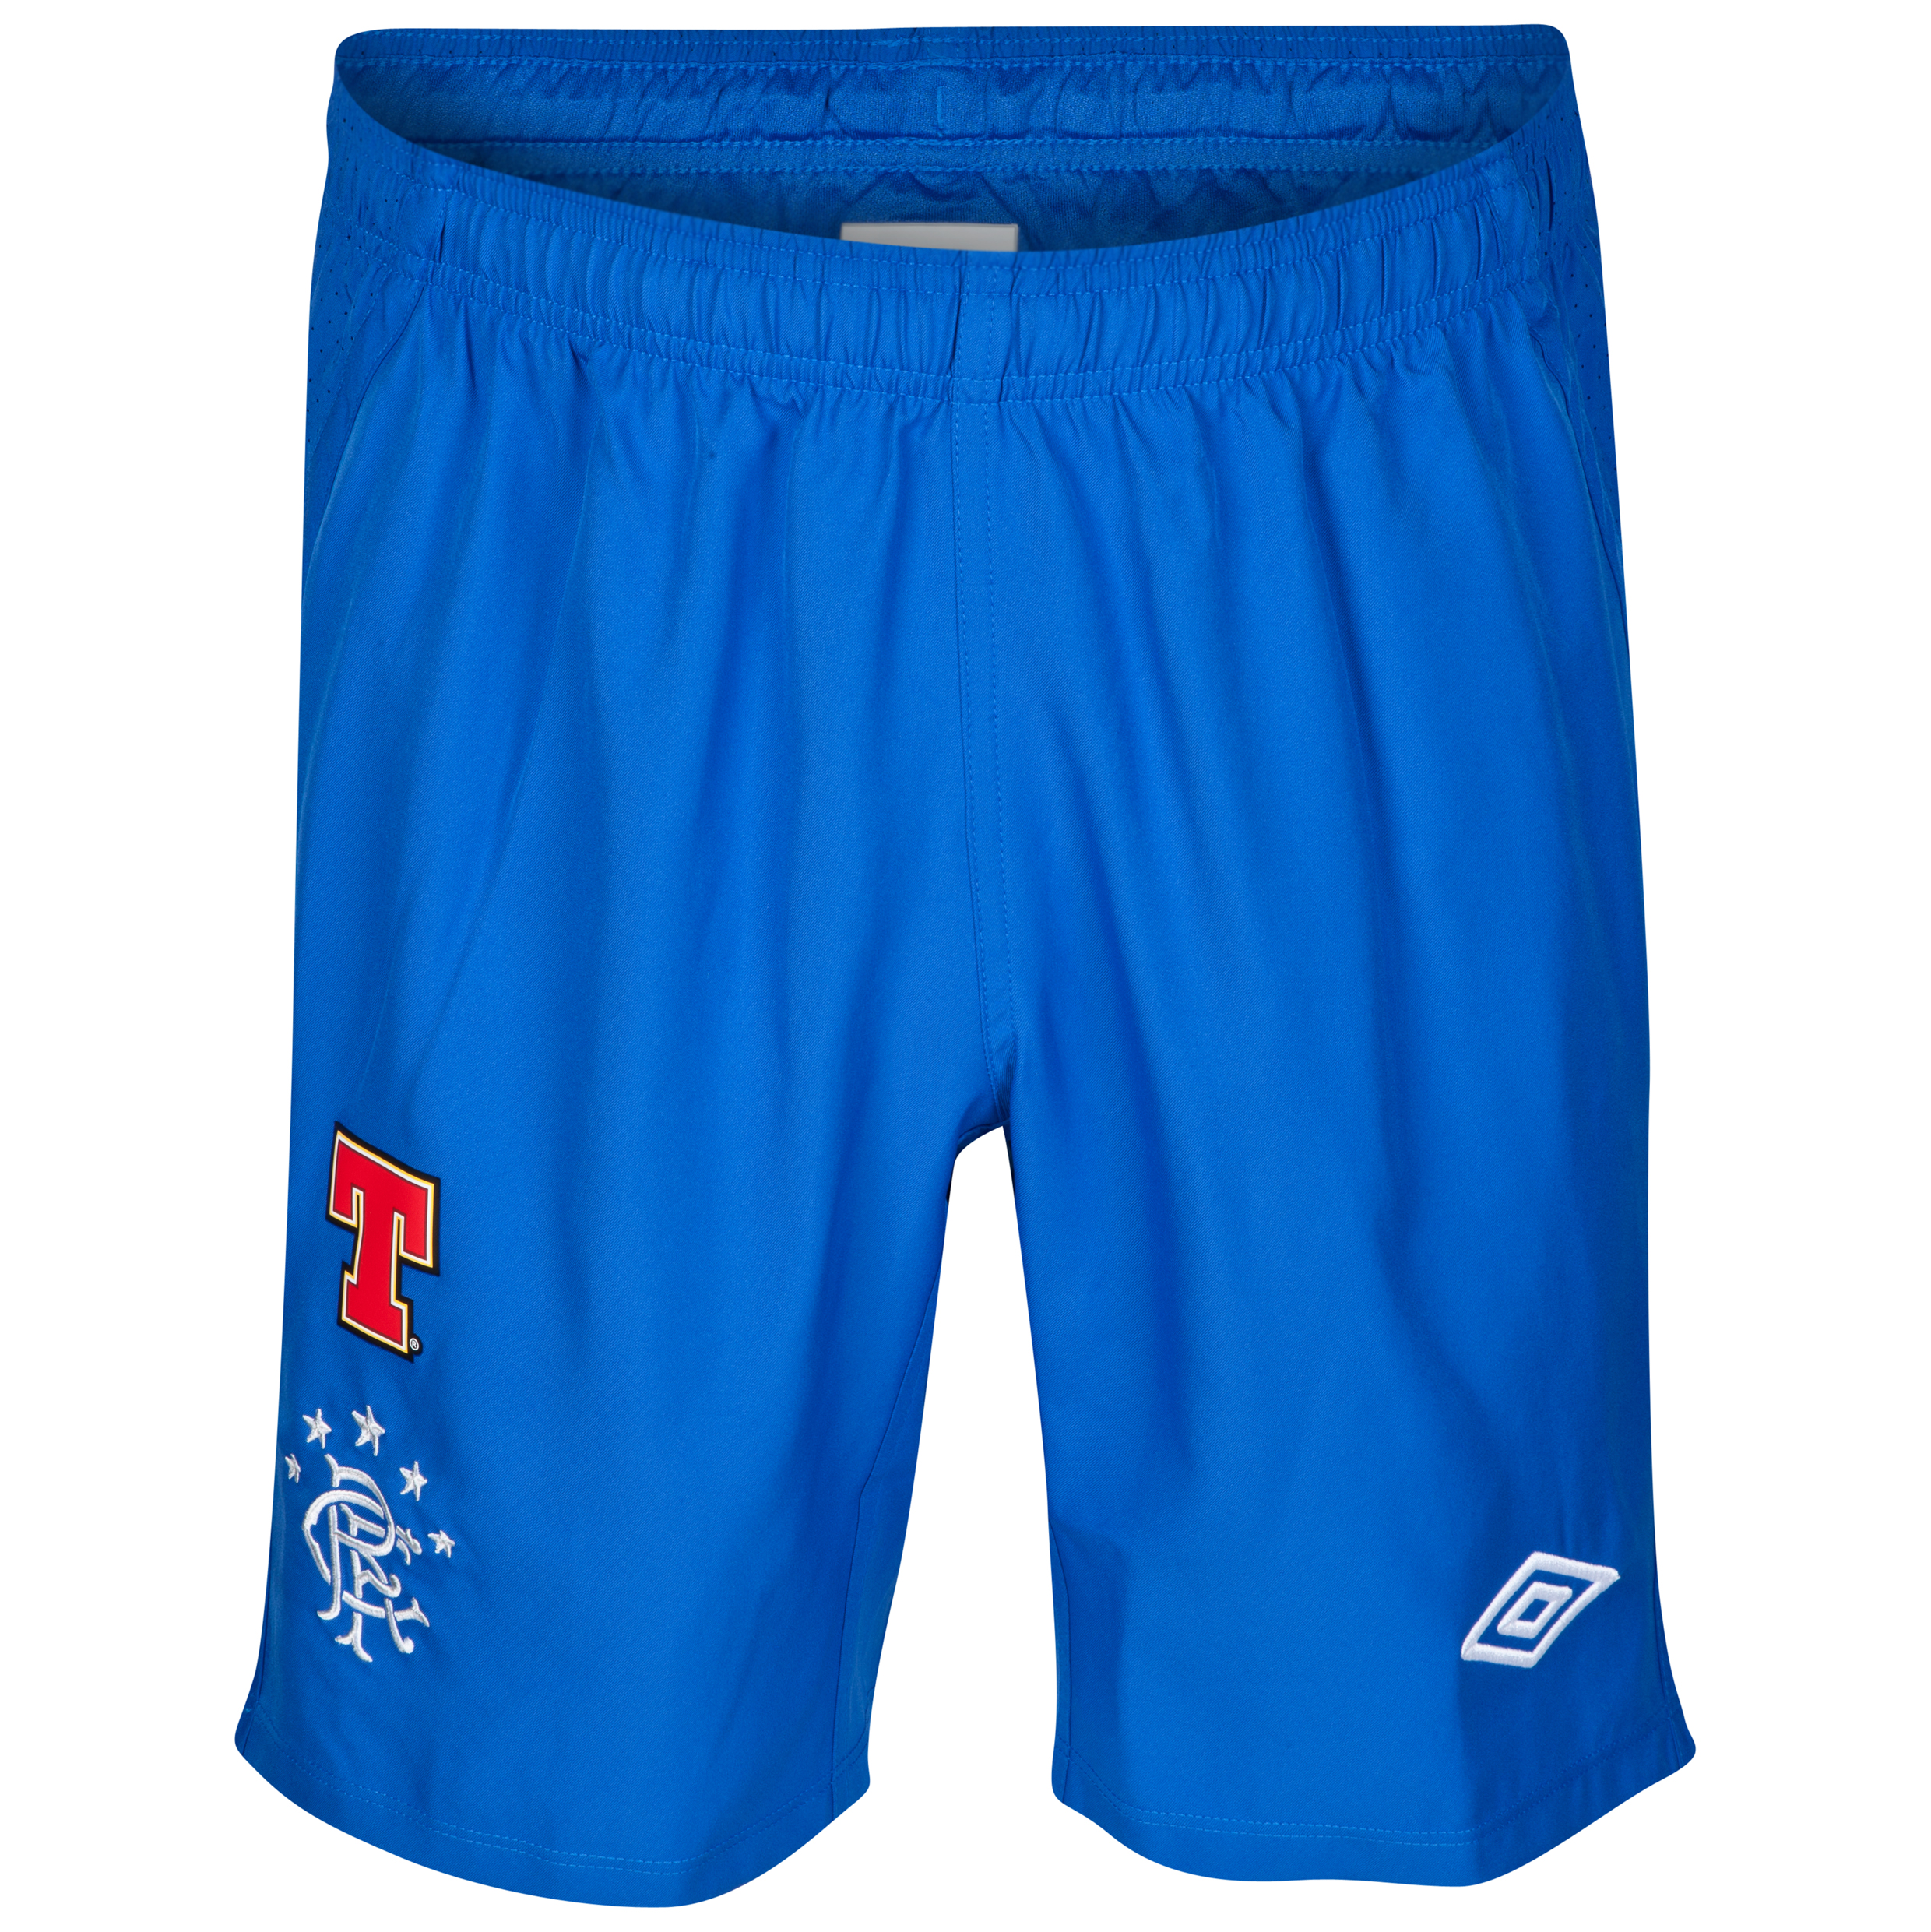 Glasgow Rangers Away Shorts 2012/13